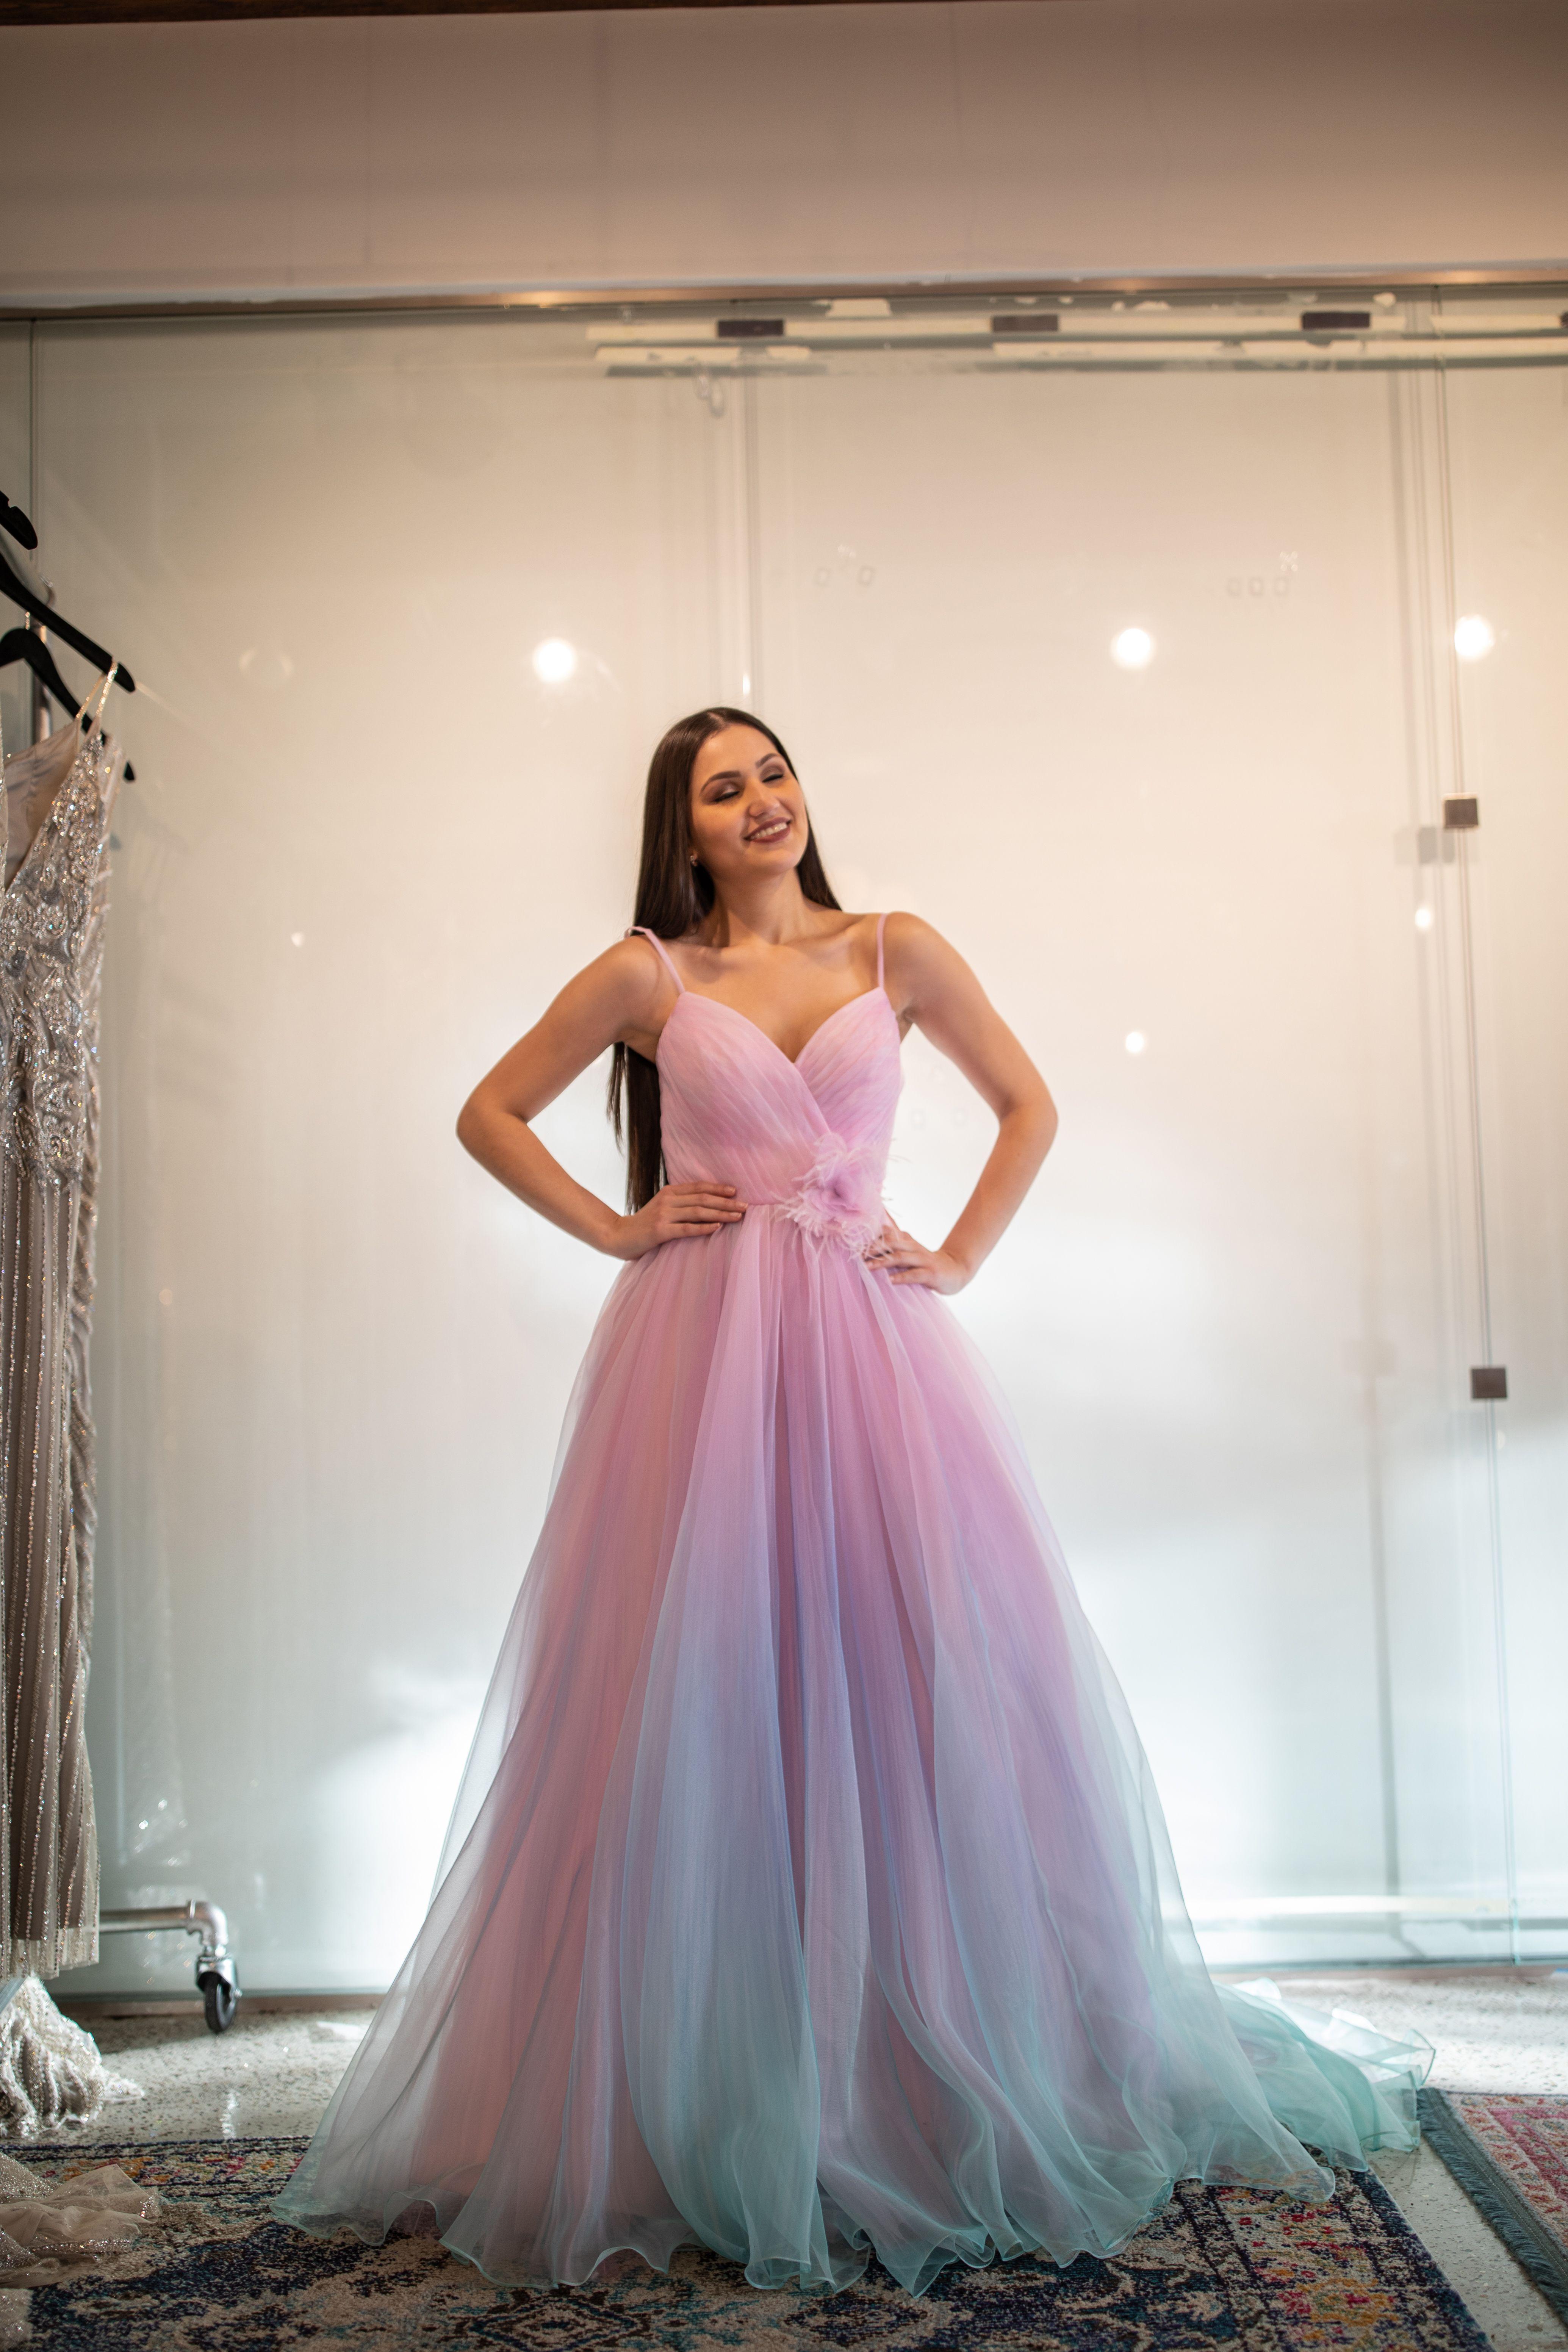 PROM DRESS IDEAS | Dresses, Gorgeous dresses, Beautiful gowns